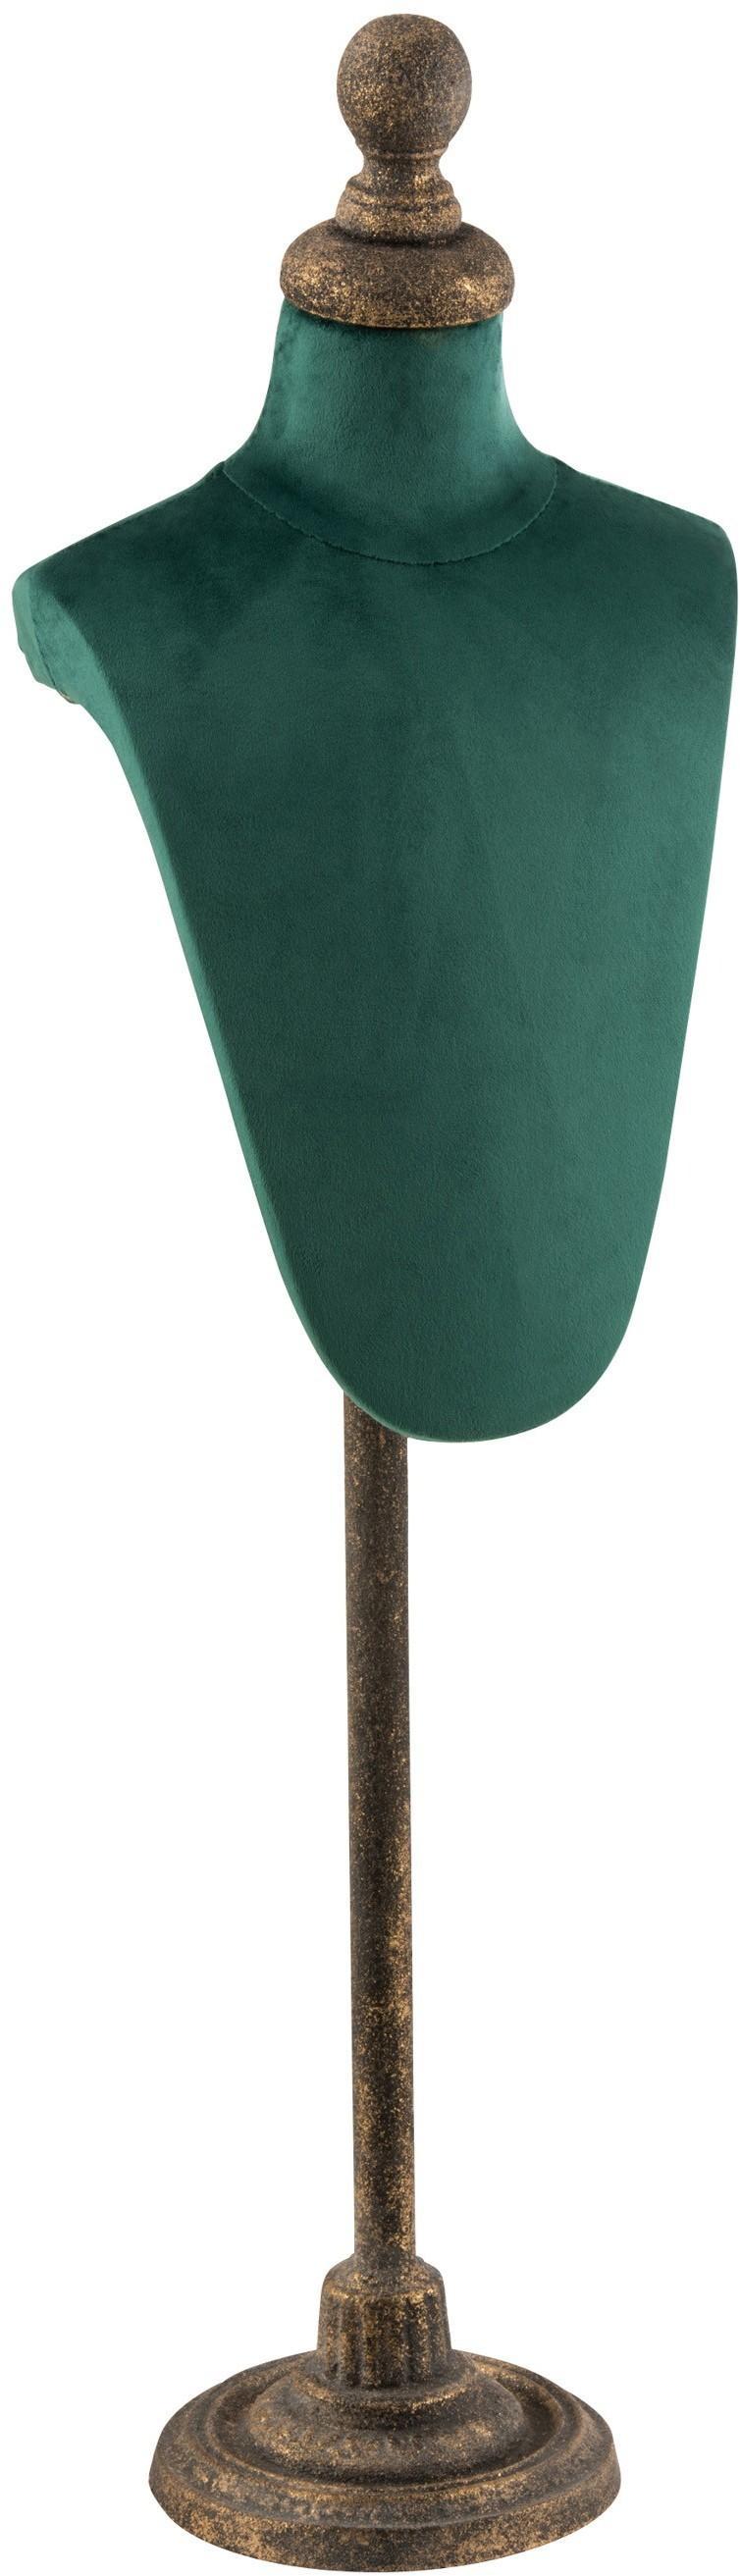 Menšie figuríny so zelenou zamatovú látkou Torso - 26 * 19 * 80 cm